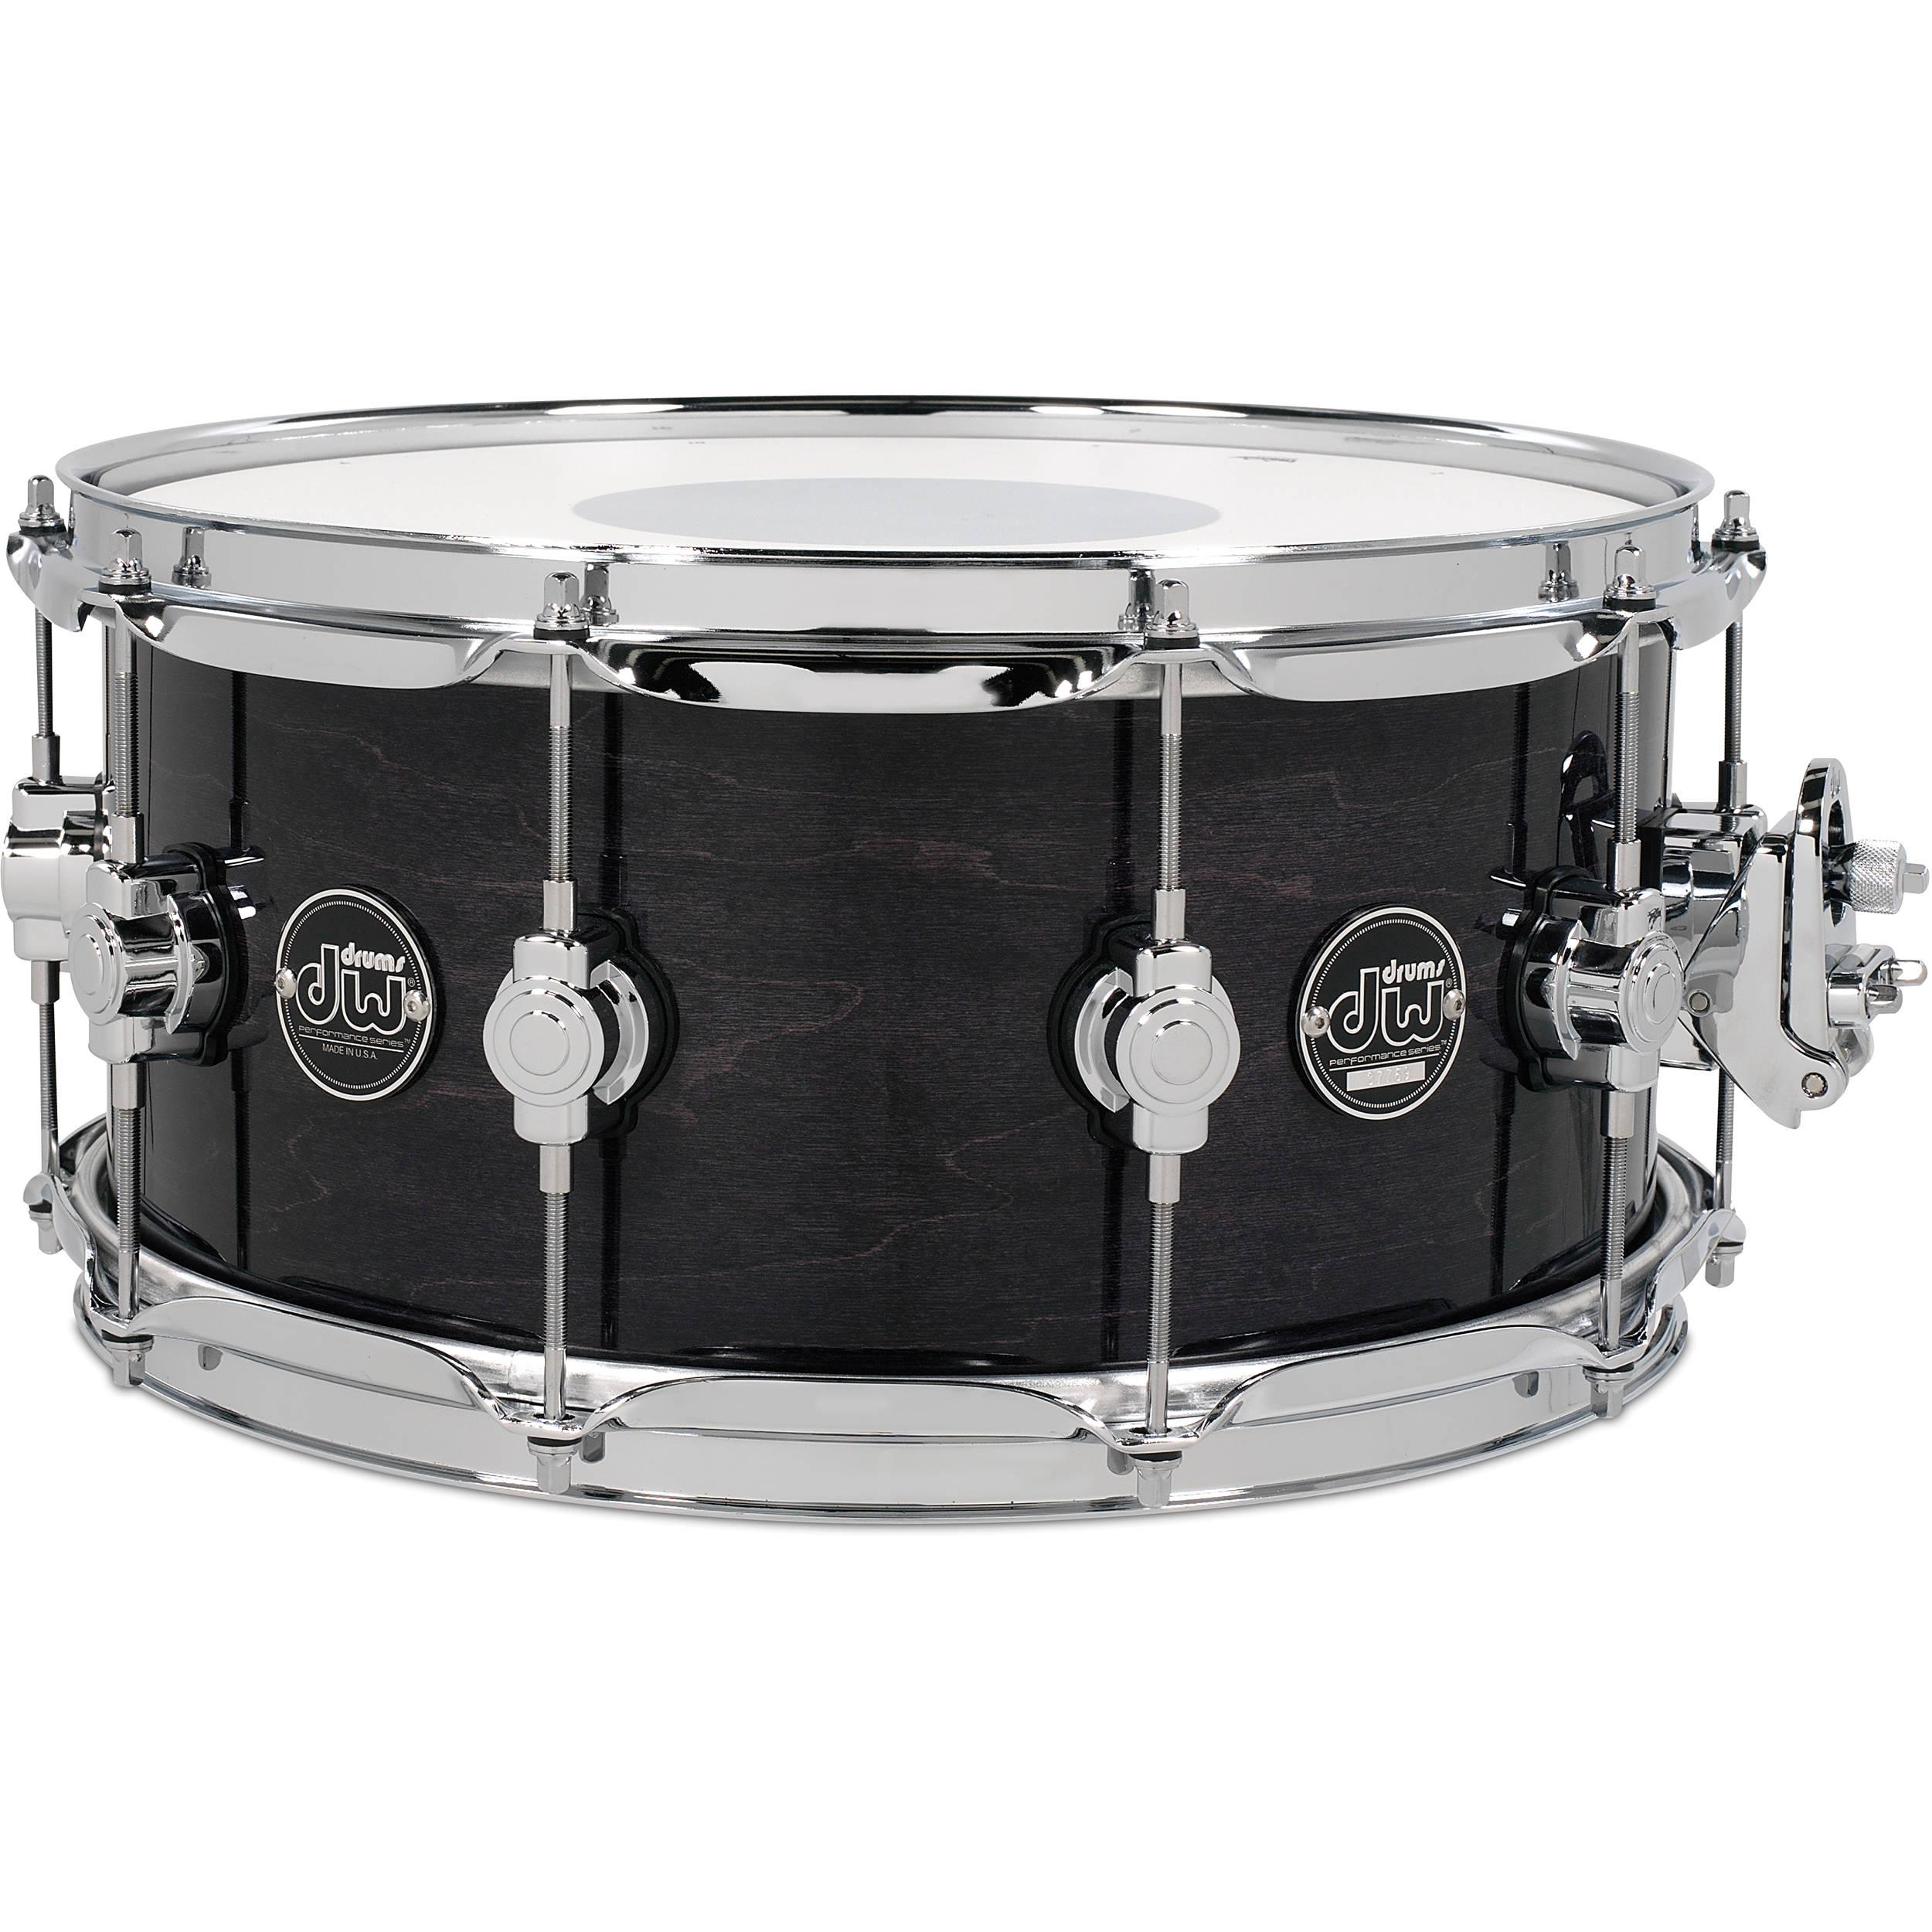 dw drums performance series 6 5 x 14 snare drpl6514sses. Black Bedroom Furniture Sets. Home Design Ideas